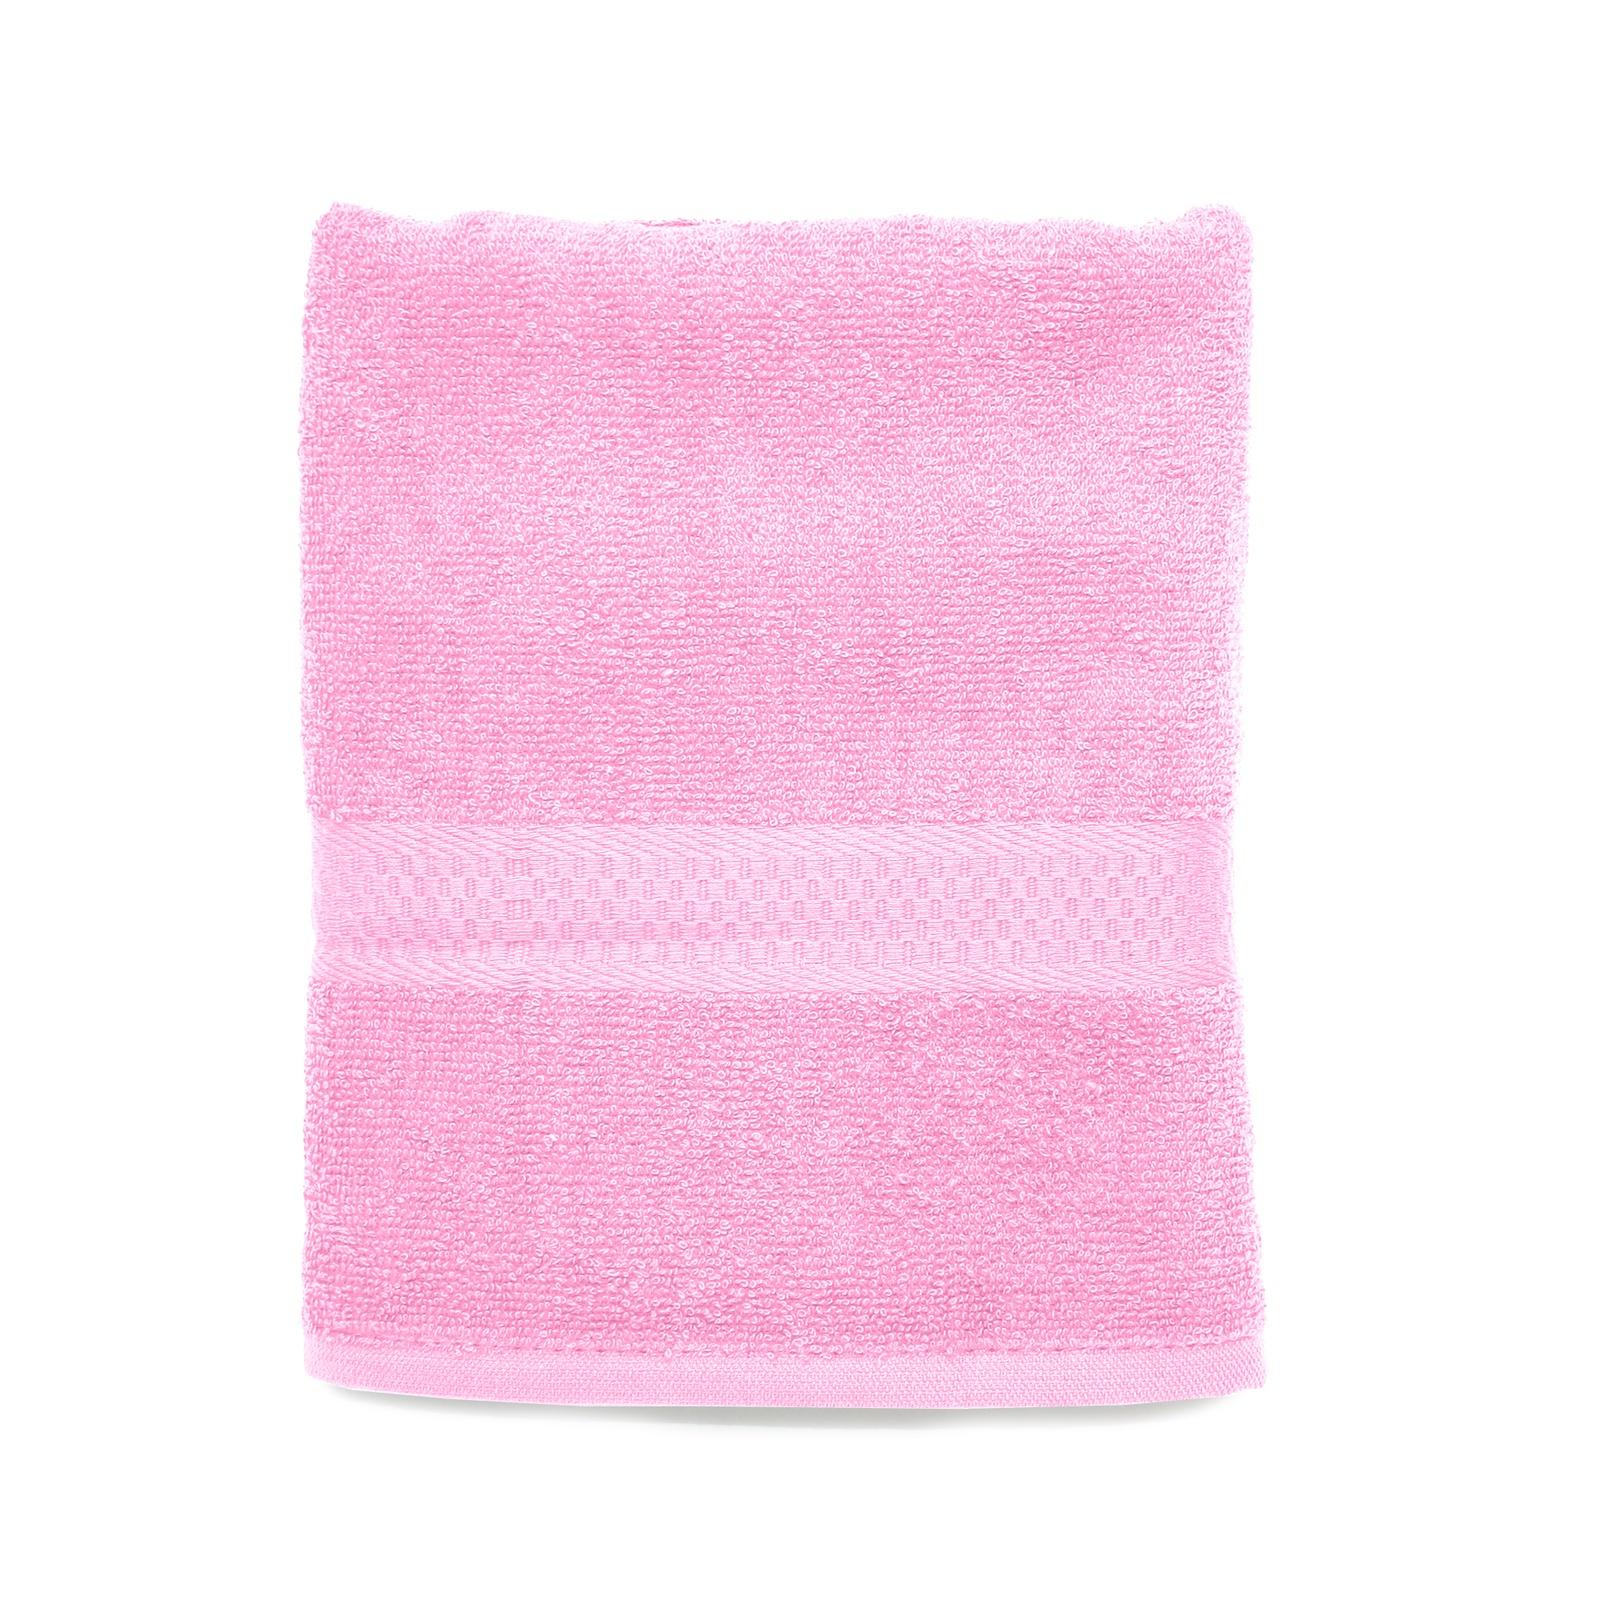 Полотенце банное Spany, 21311318182, махровое, розовый, 50 х 90 см полотенце банное mona liza orchid цвет белый 50 х 90 см